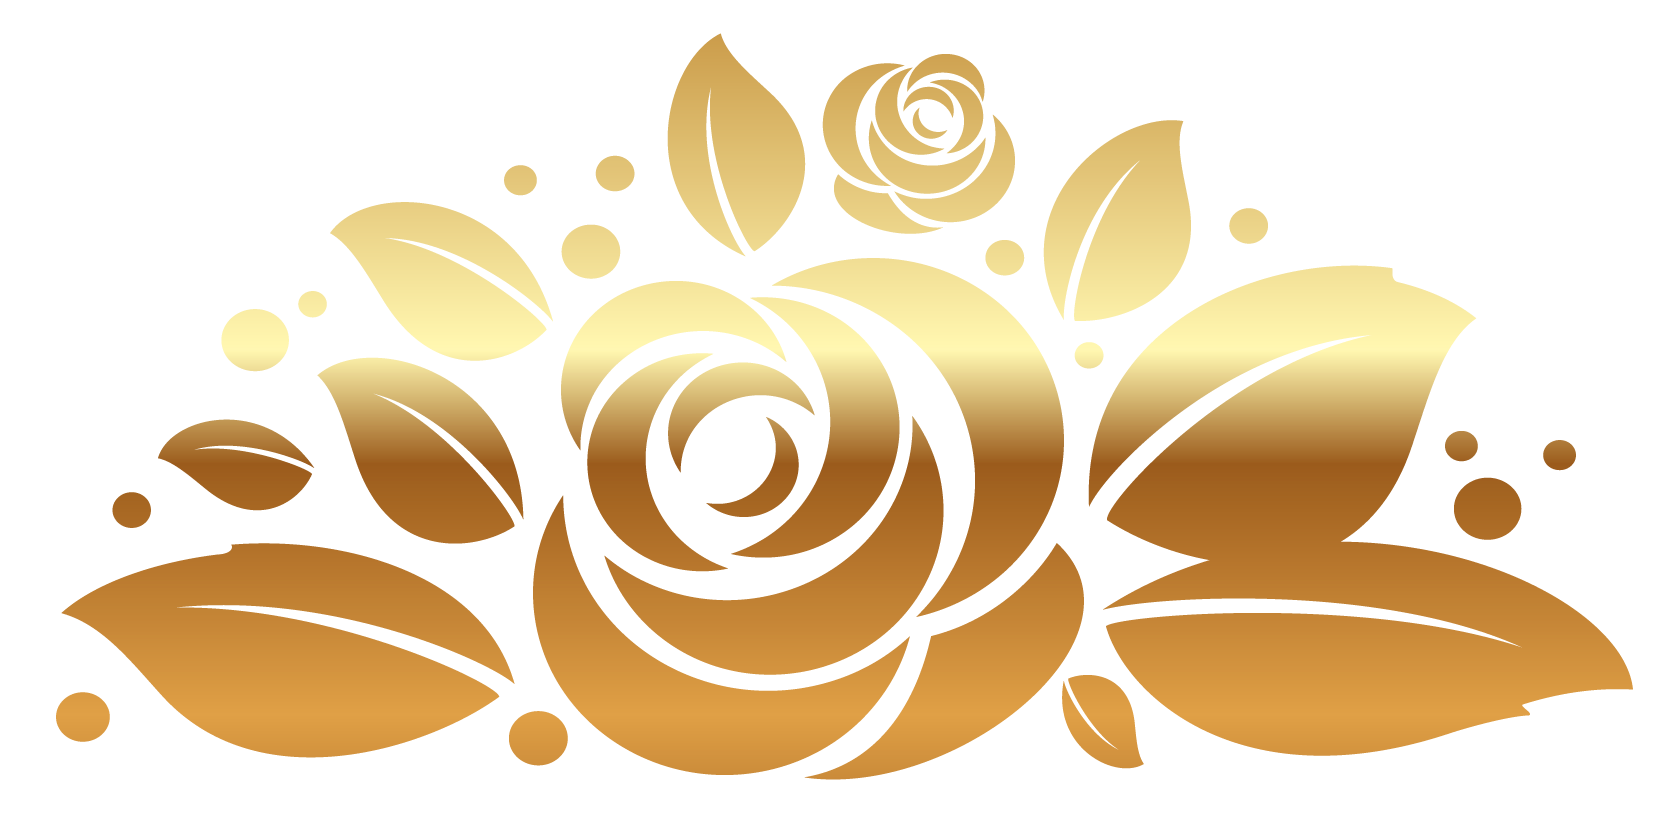 svg black and white download Gold rose decor png. Golden clipart